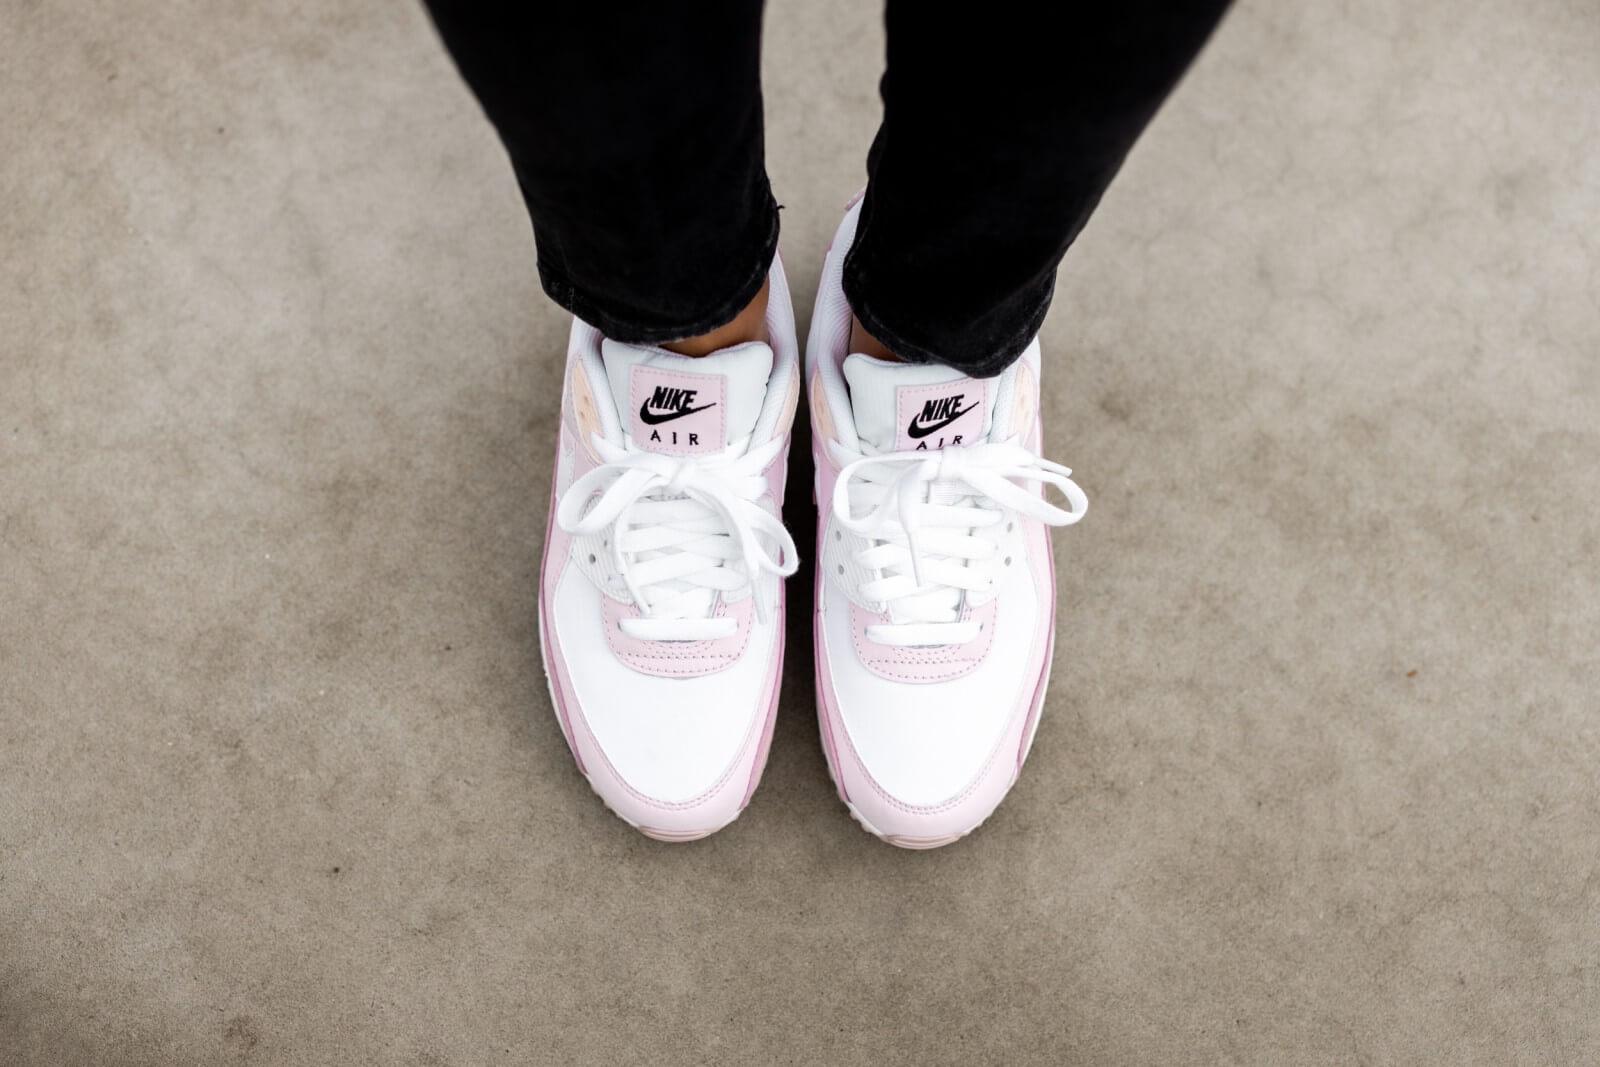 Nike Women's Air Max 90 White/Champagne-Light Violet